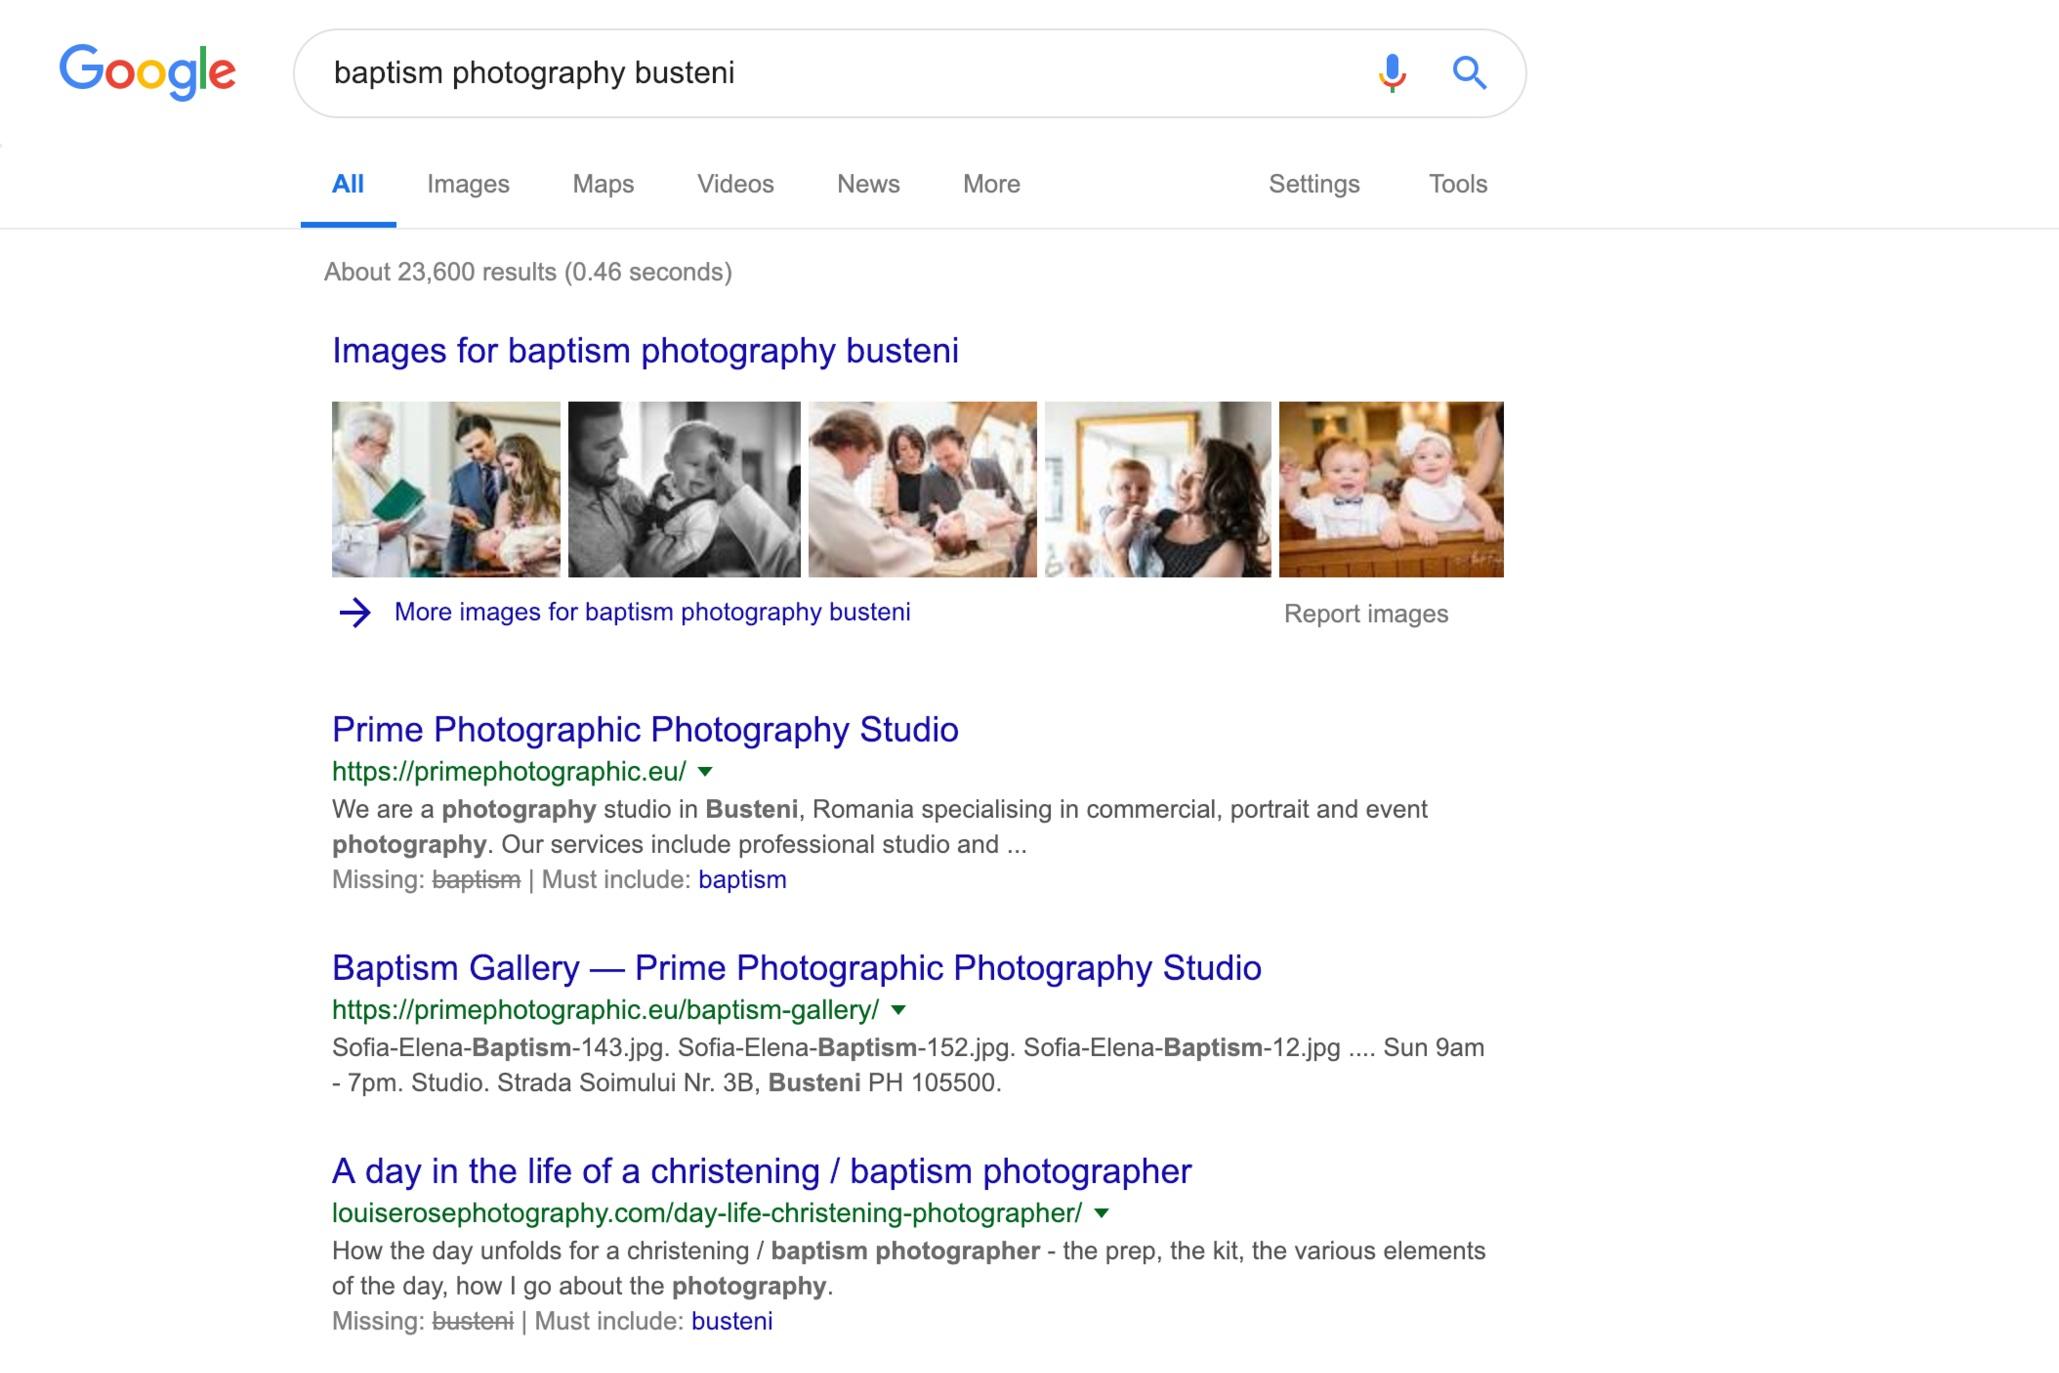 'baptism photography busteni'